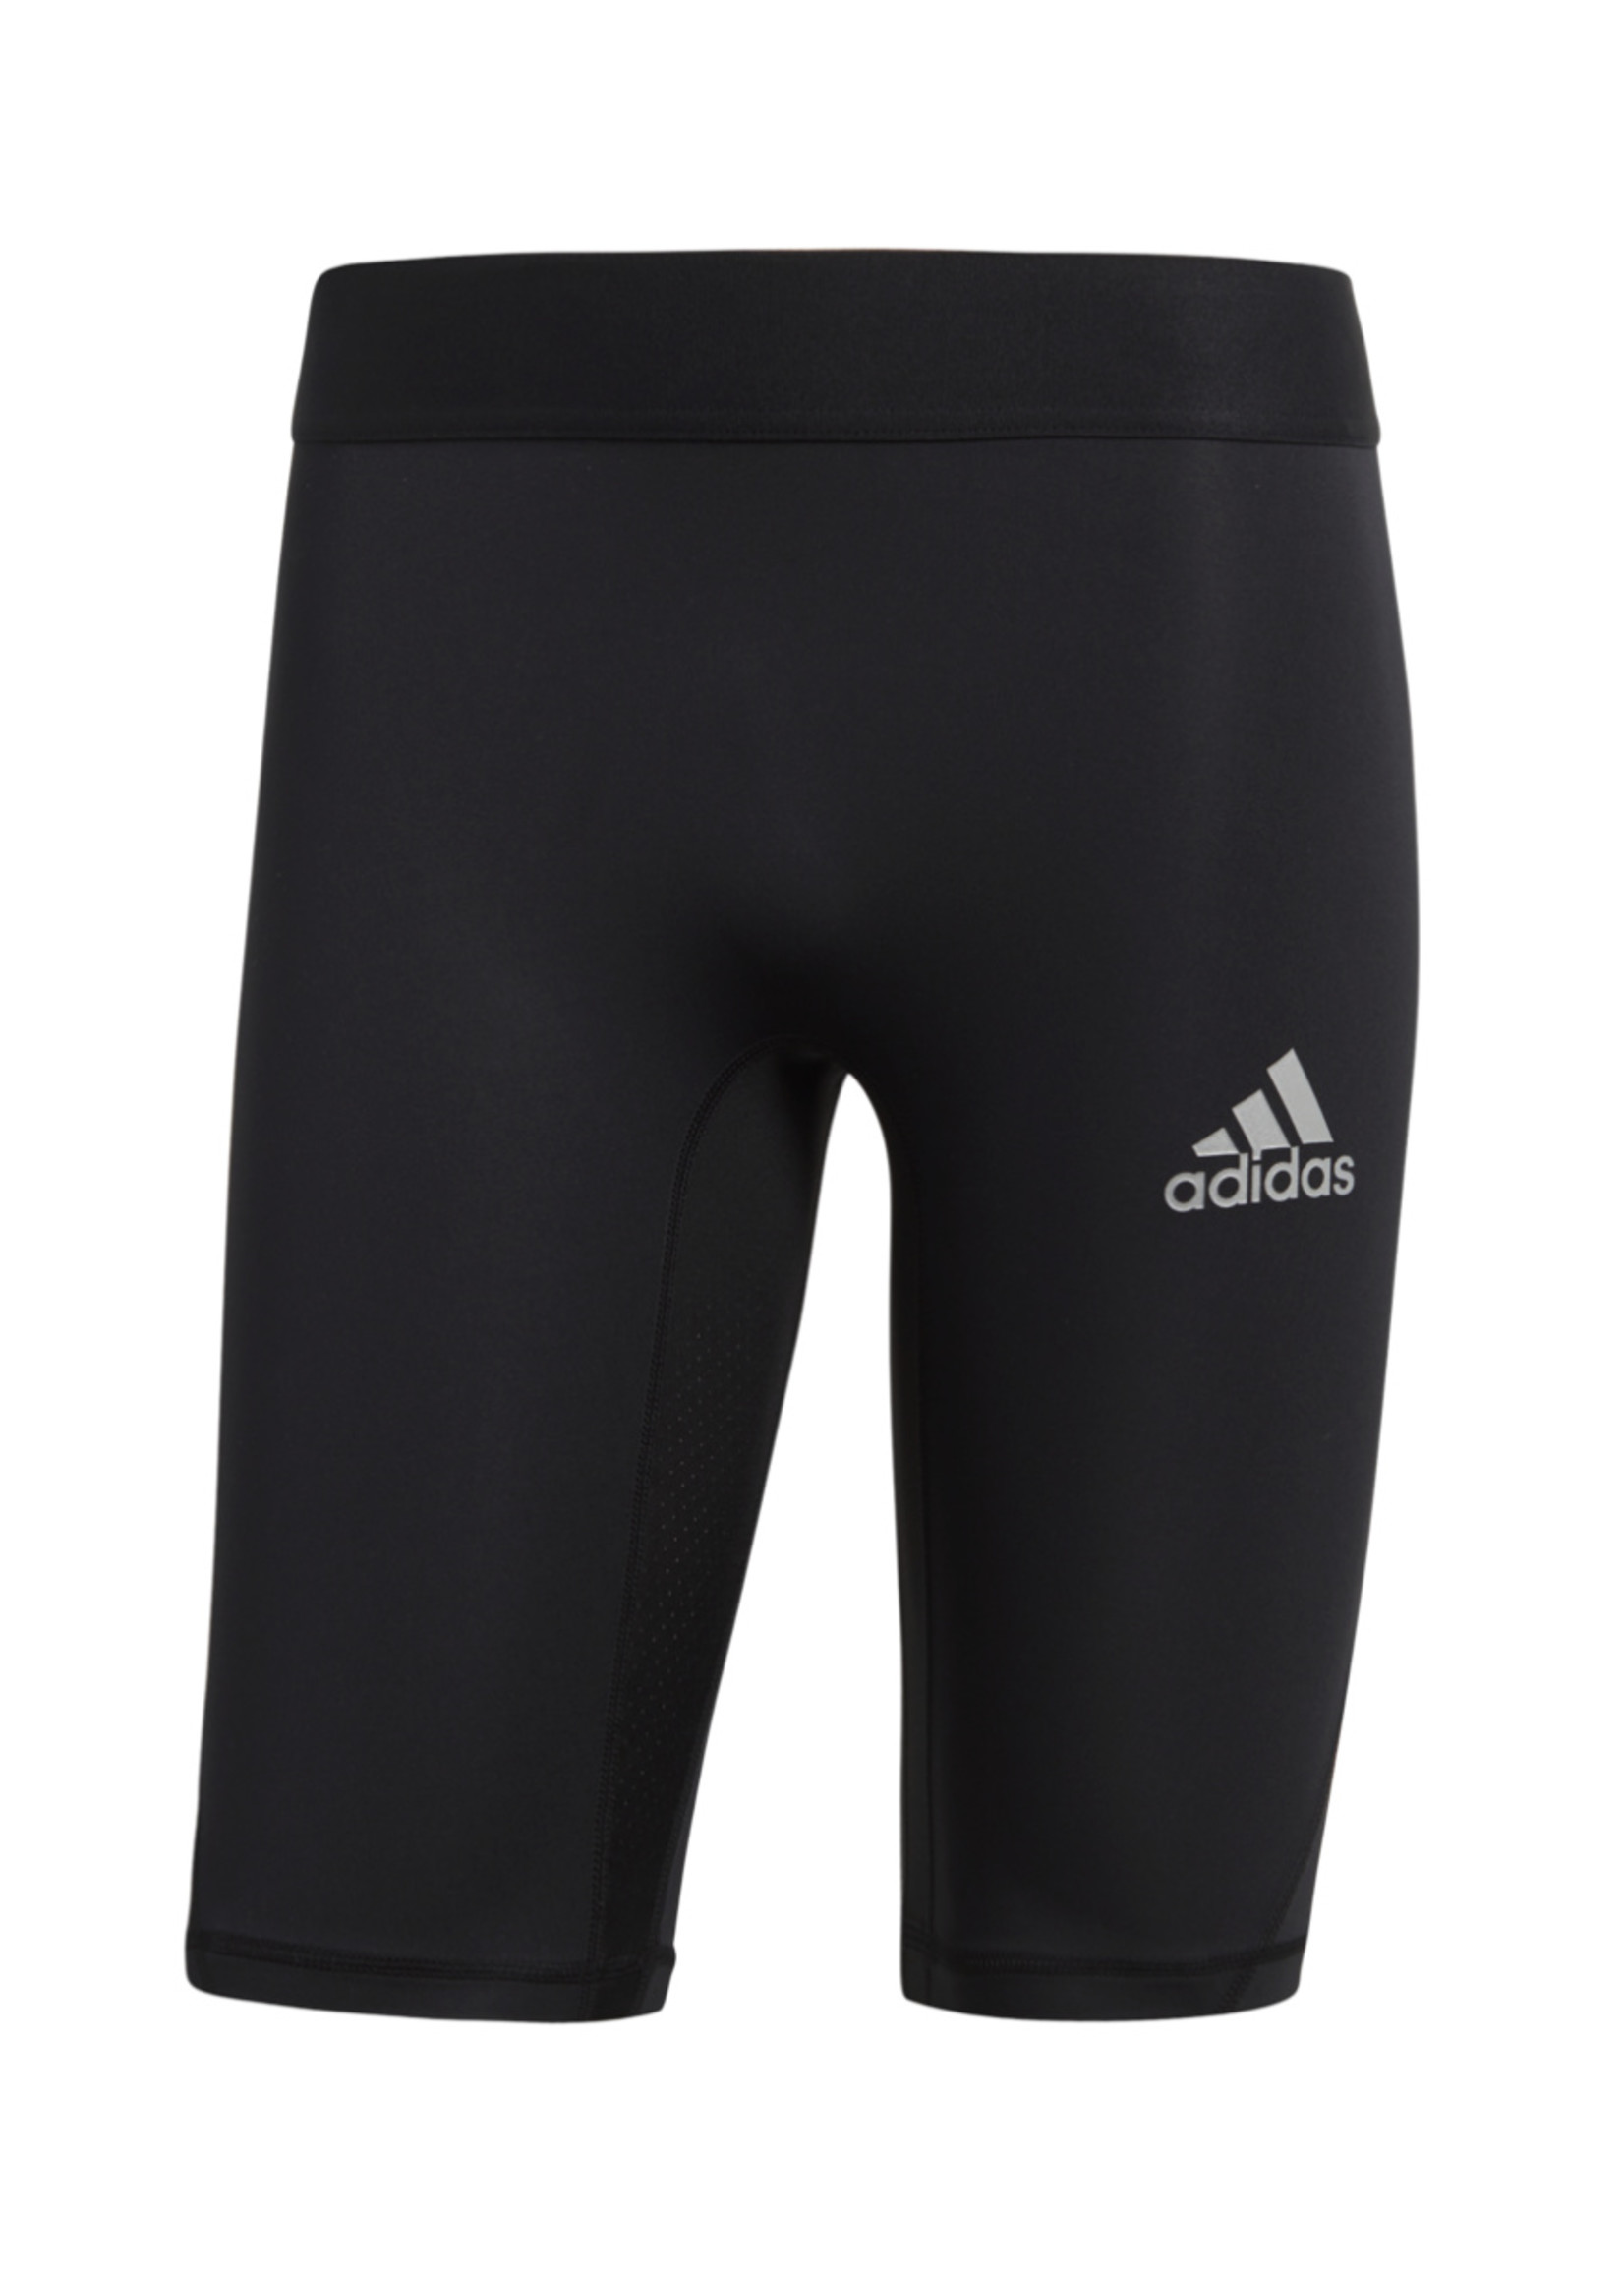 Adidas Compression Black Short Adult